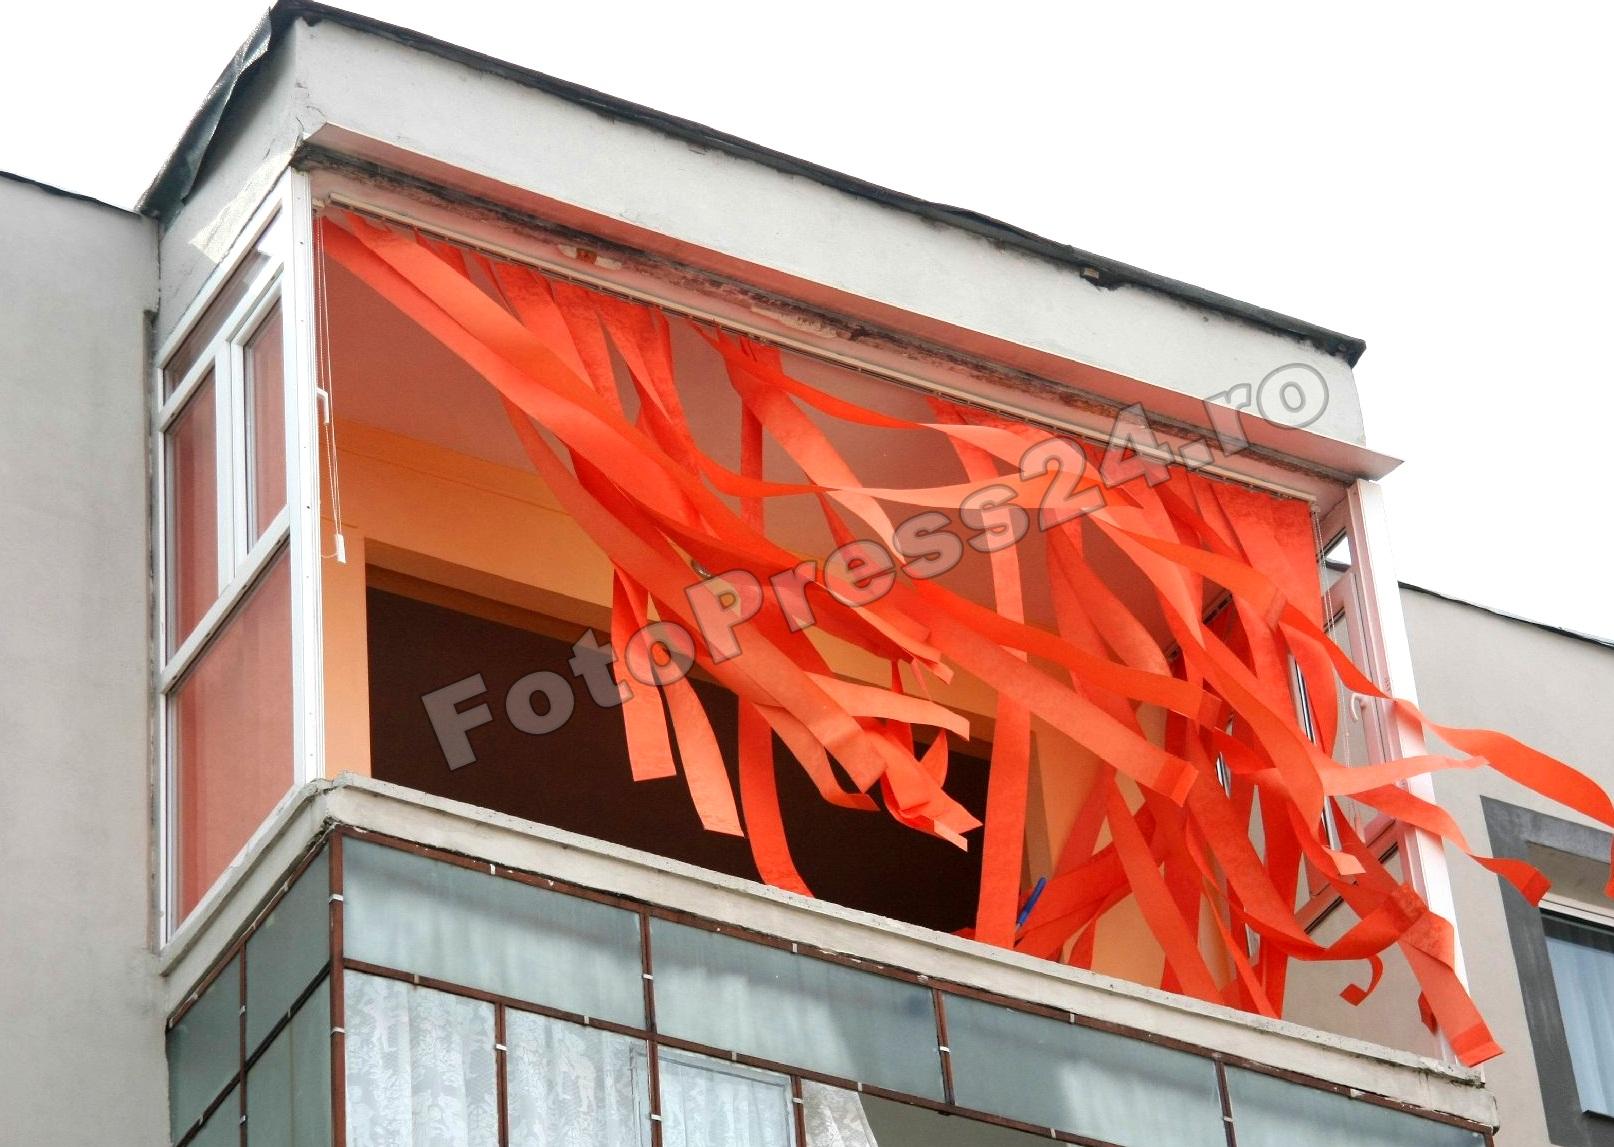 balcon distrus de vant-FotoPress24.ro-Mihai Neacsu (2)